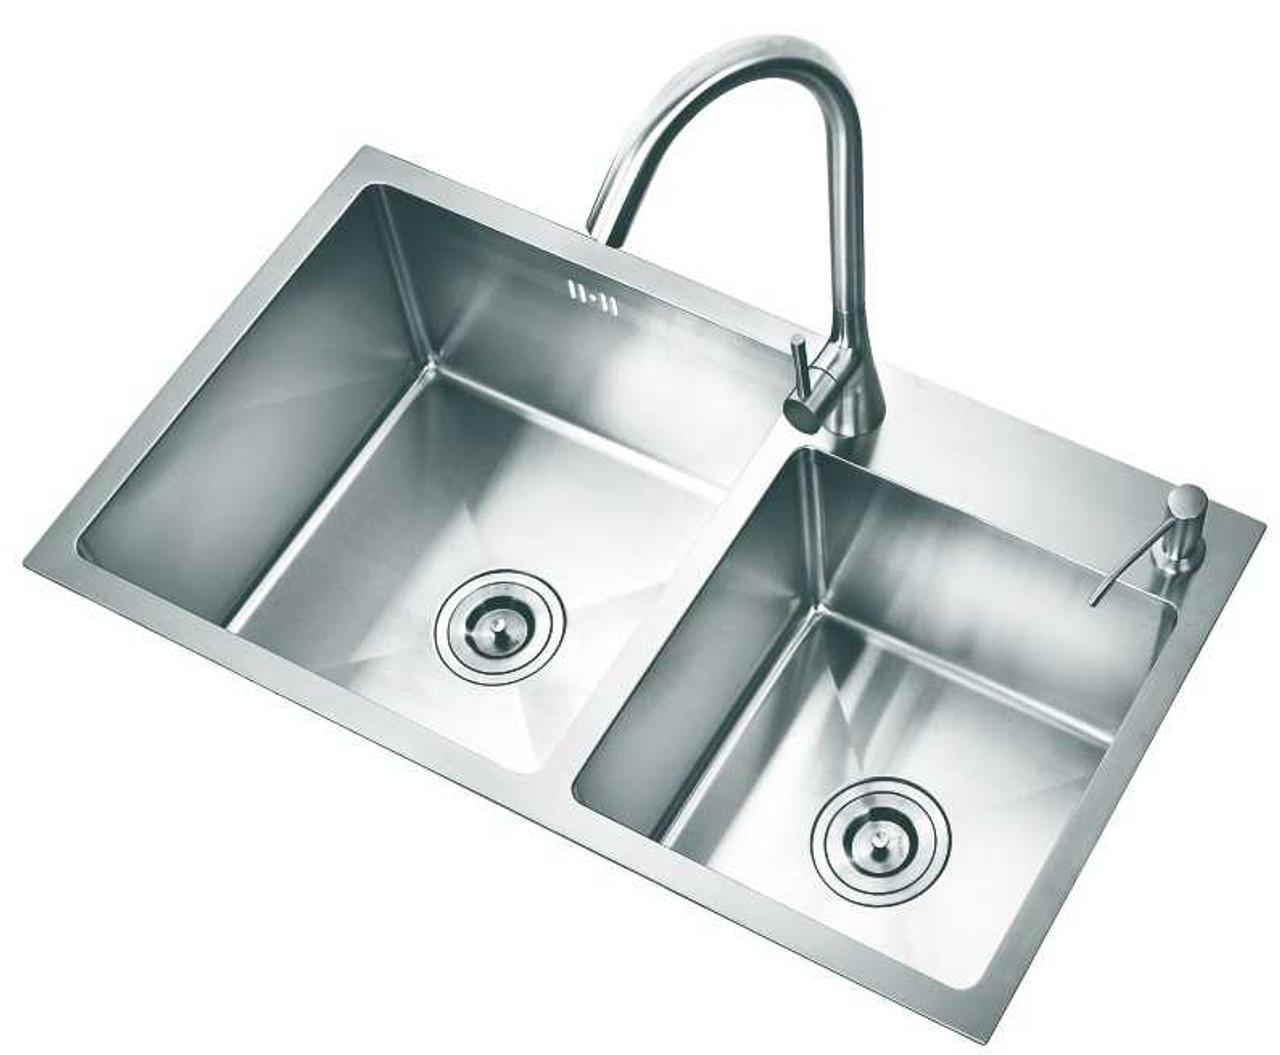 kitchen sink stainless steel shm3218 304 double bowl 32x18x8 7